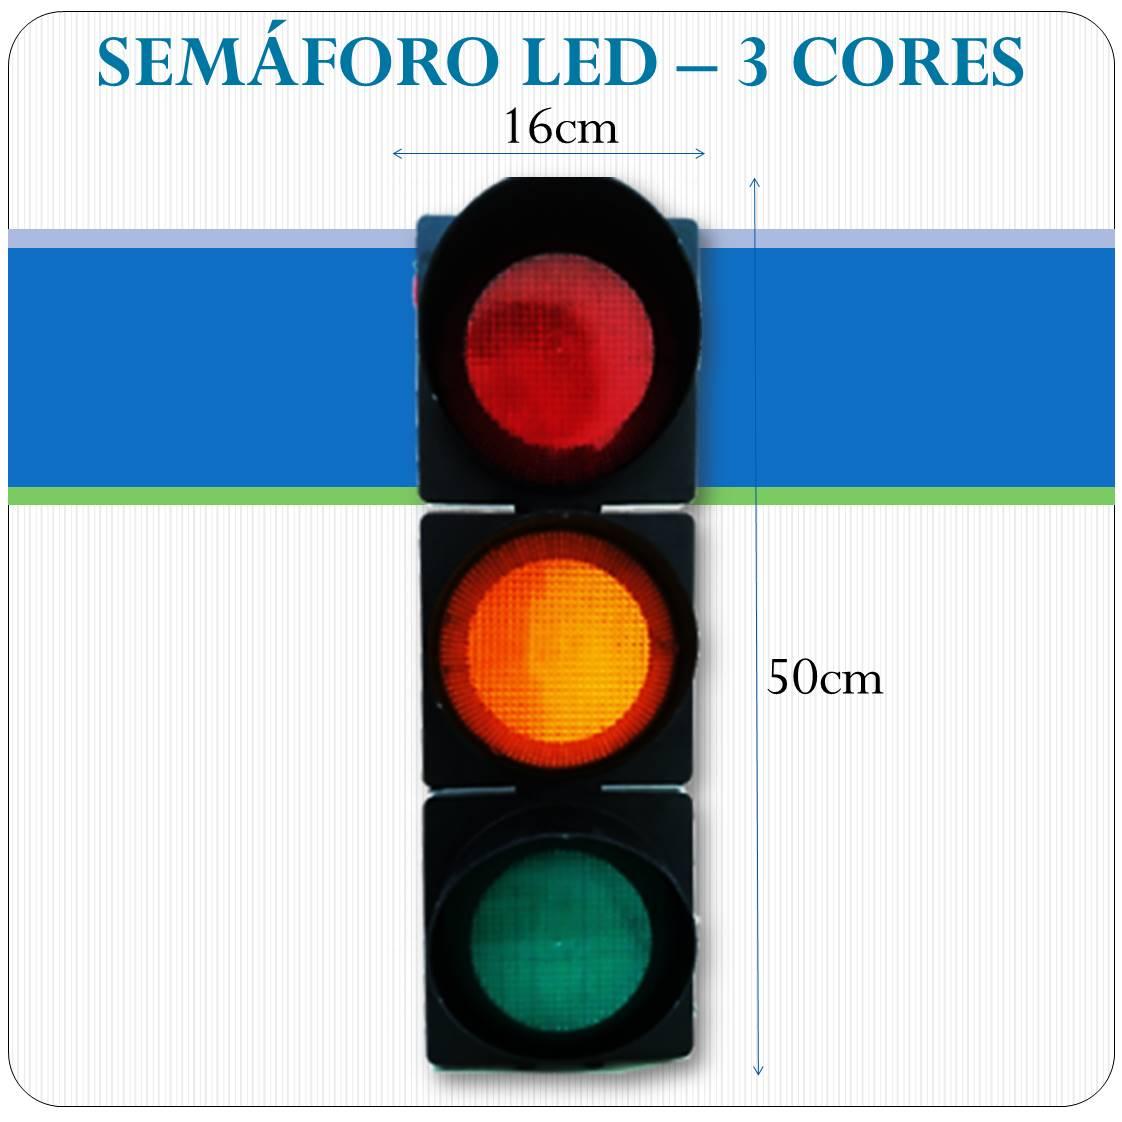 Semáforo LED - 3 Cores